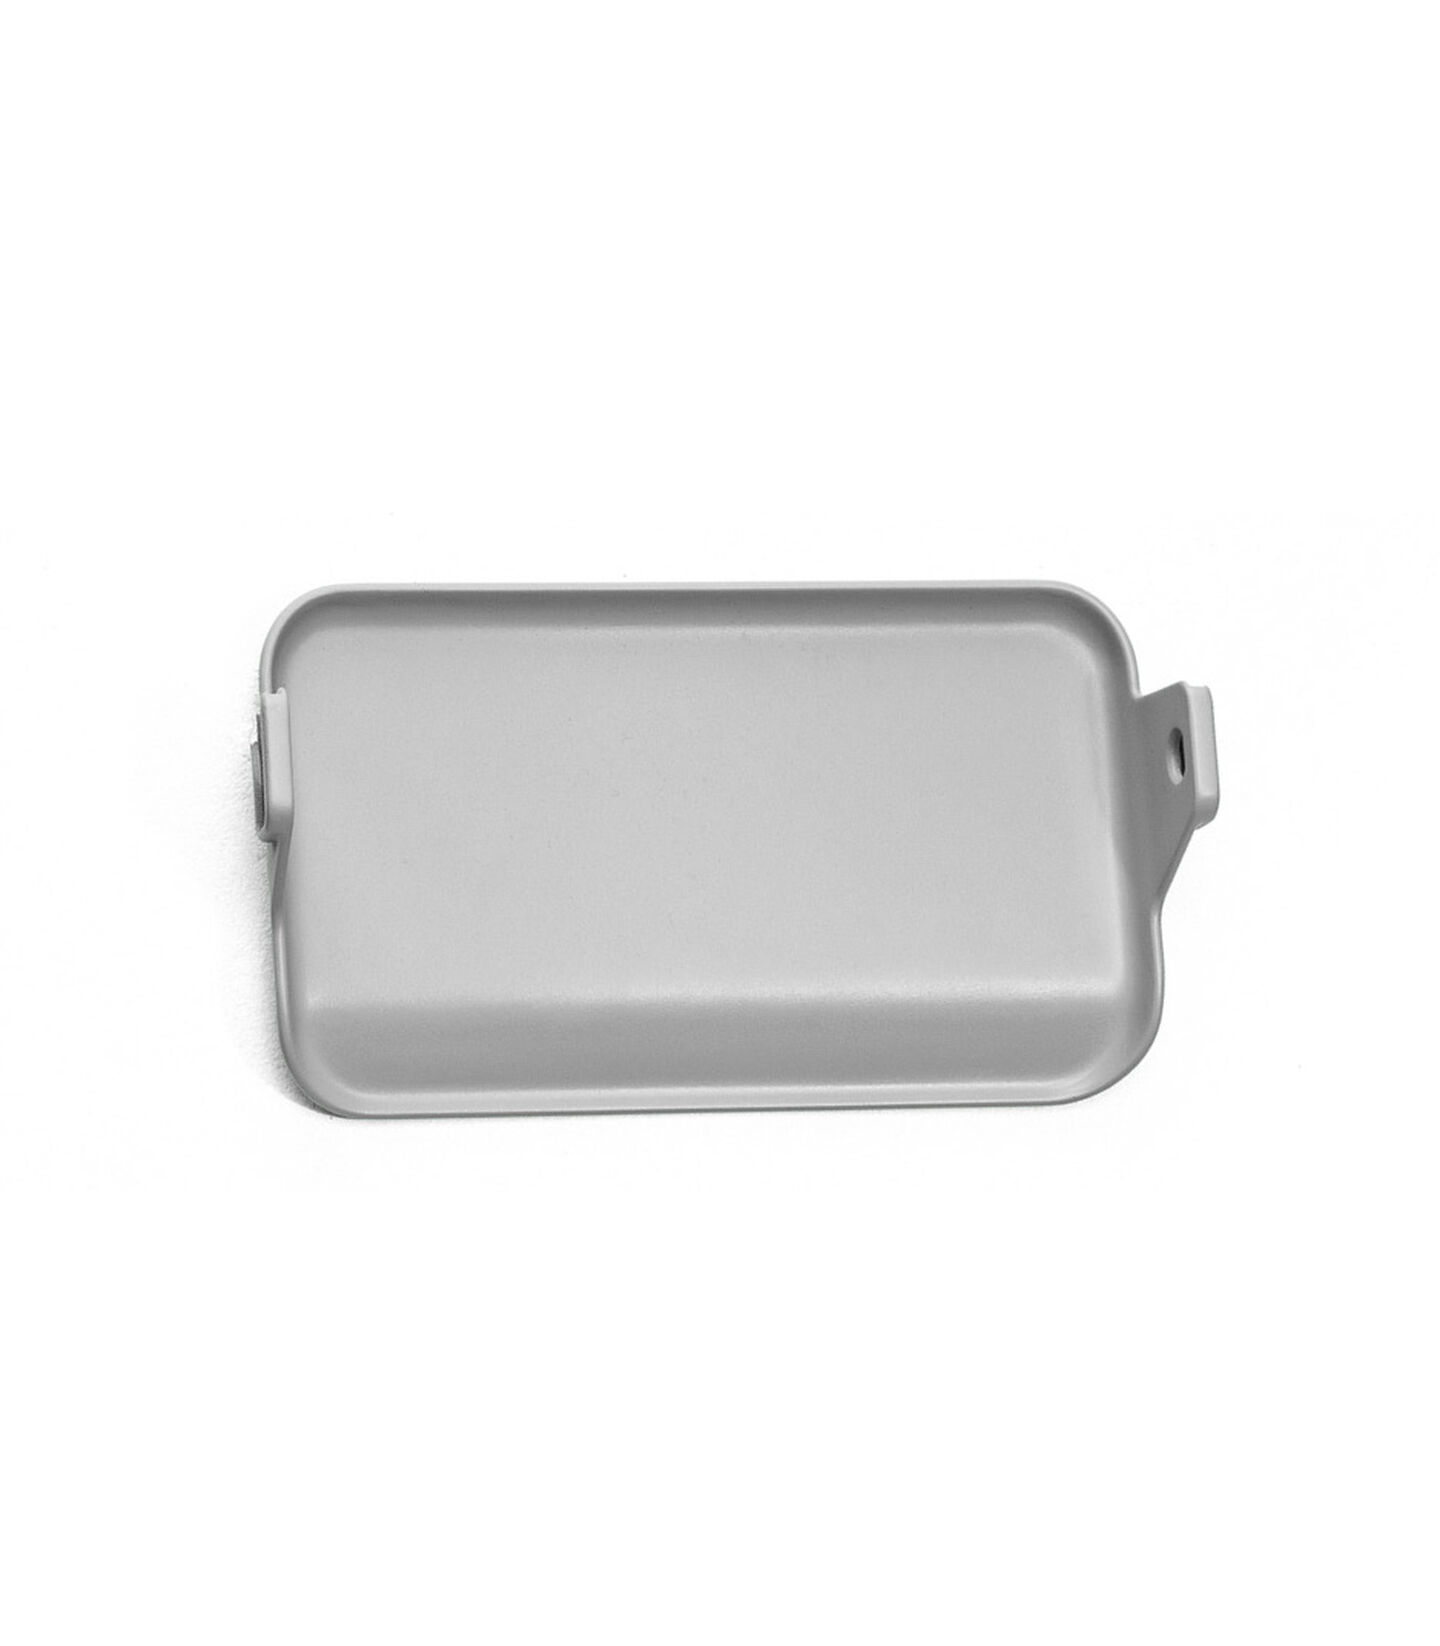 Stokke® Clikk™-fotstöd Cloud Grey, Cloud Grey, mainview view 1